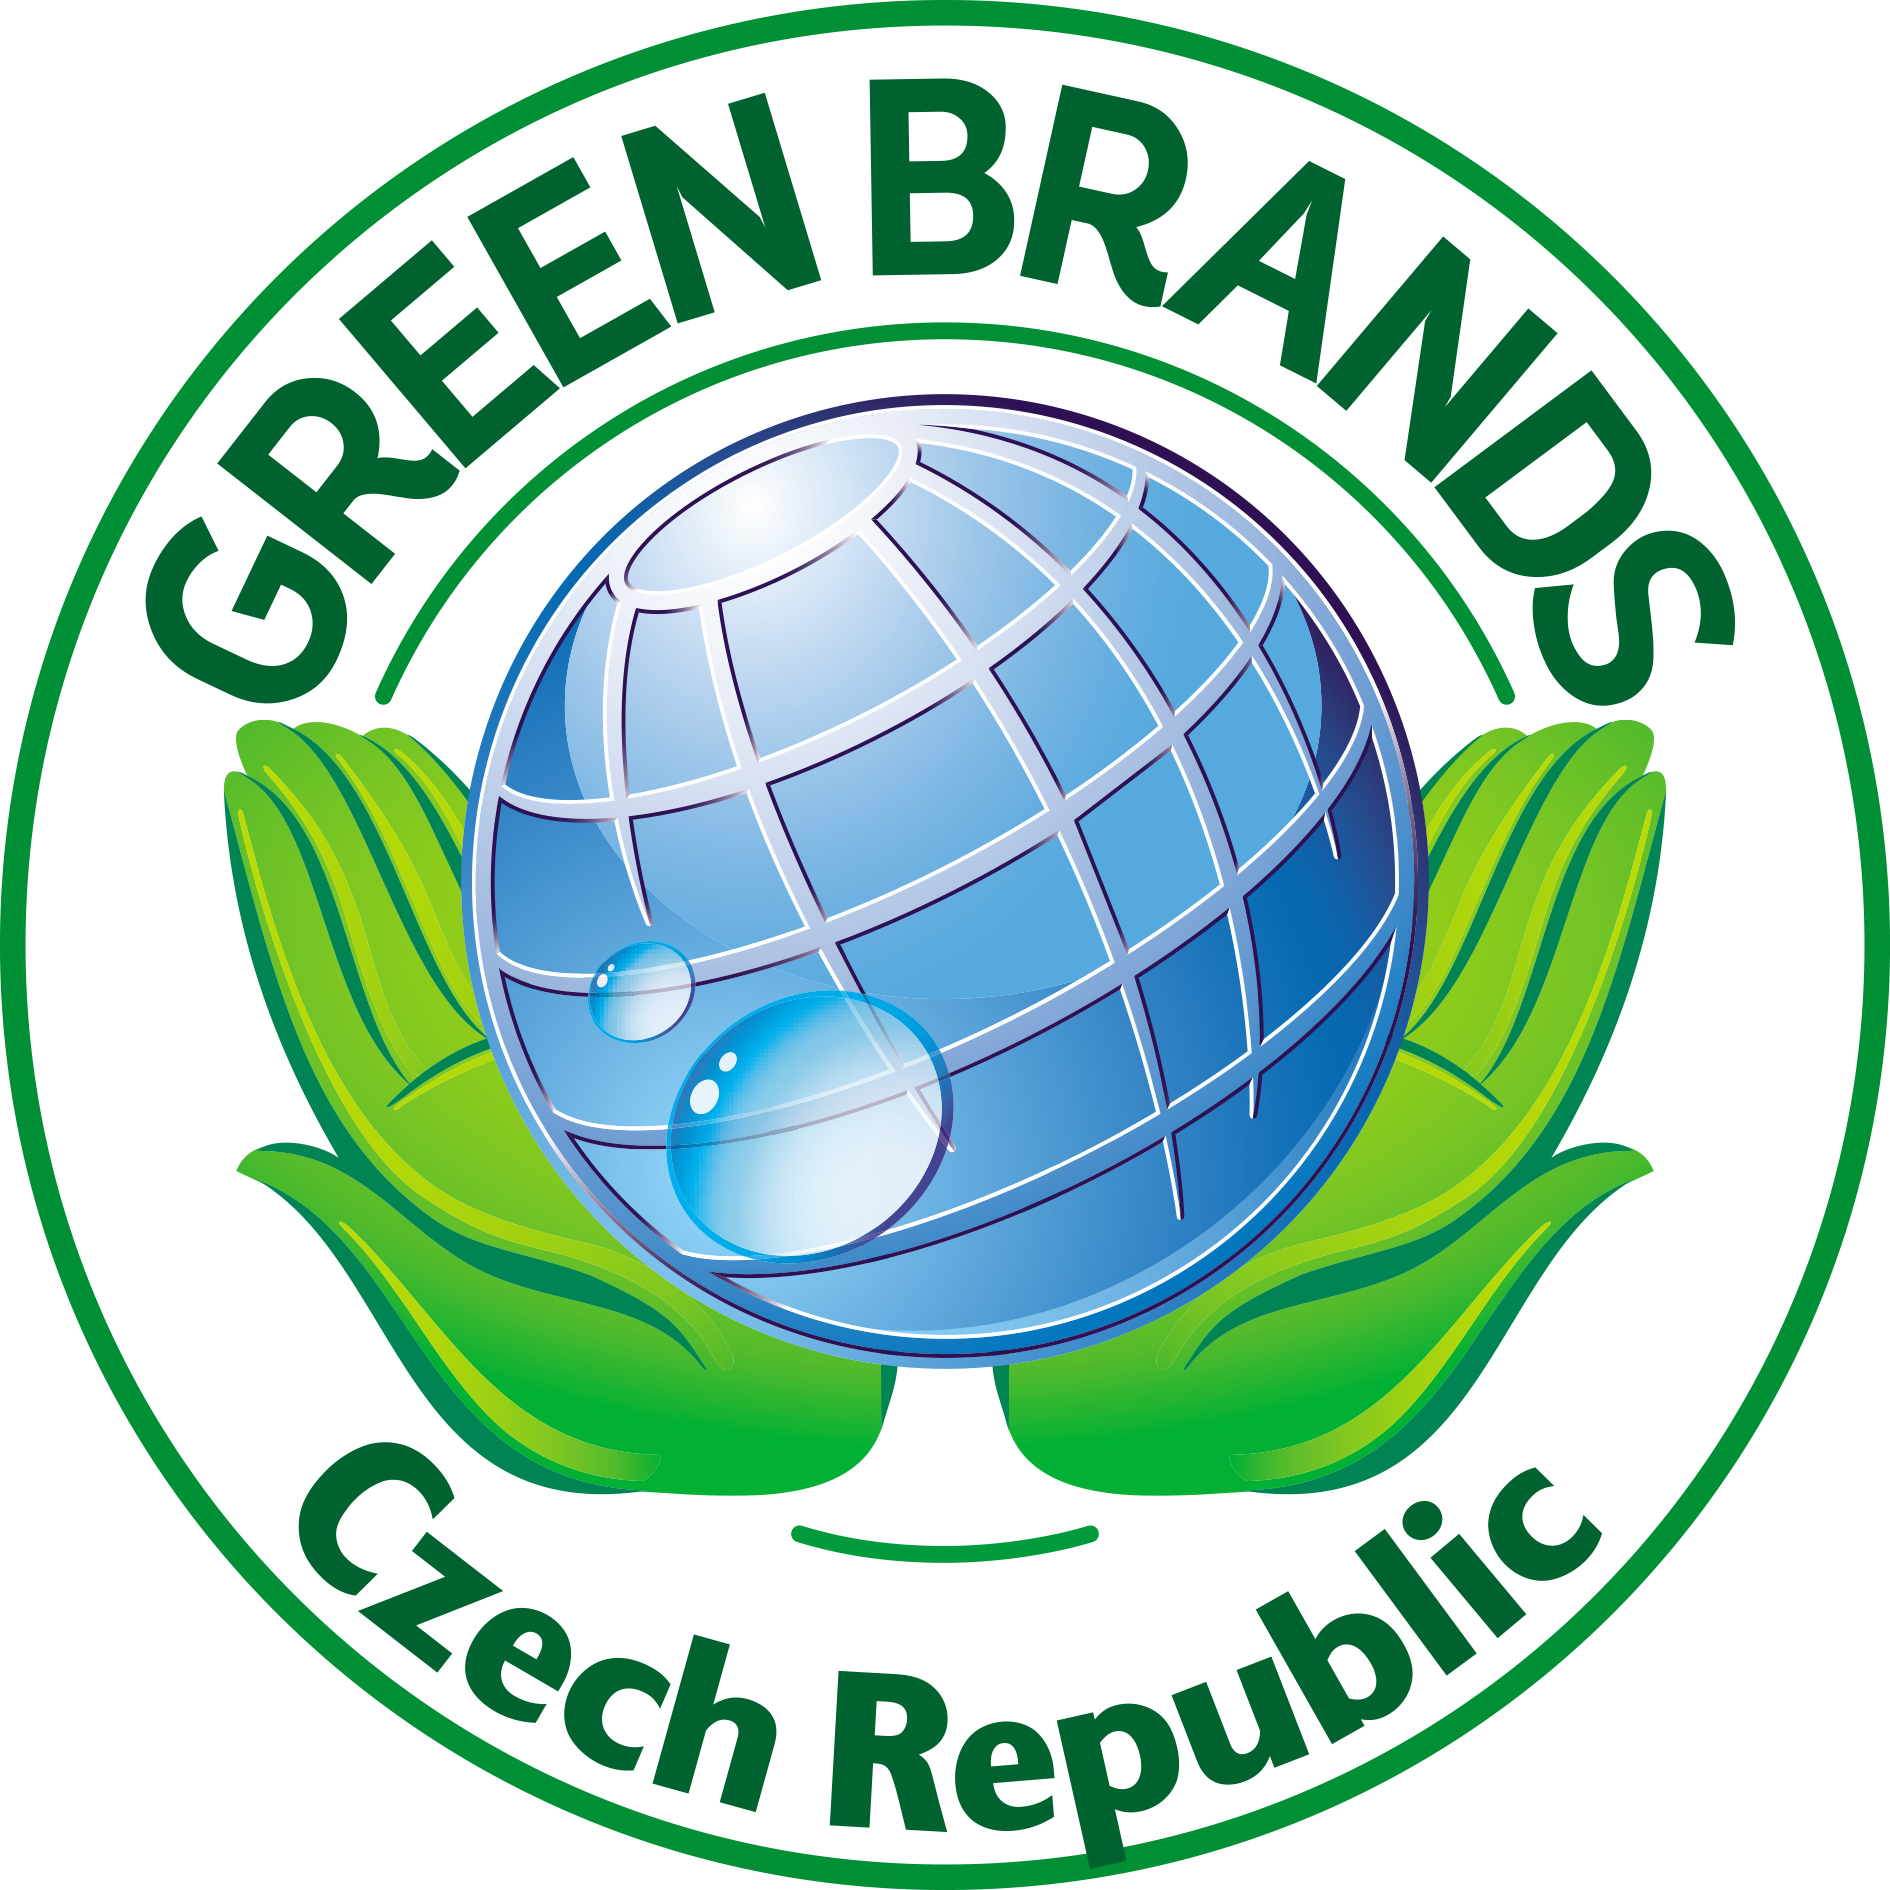 Uzavřeli jsme memorandum o spolupráci s GREEN BRANDS